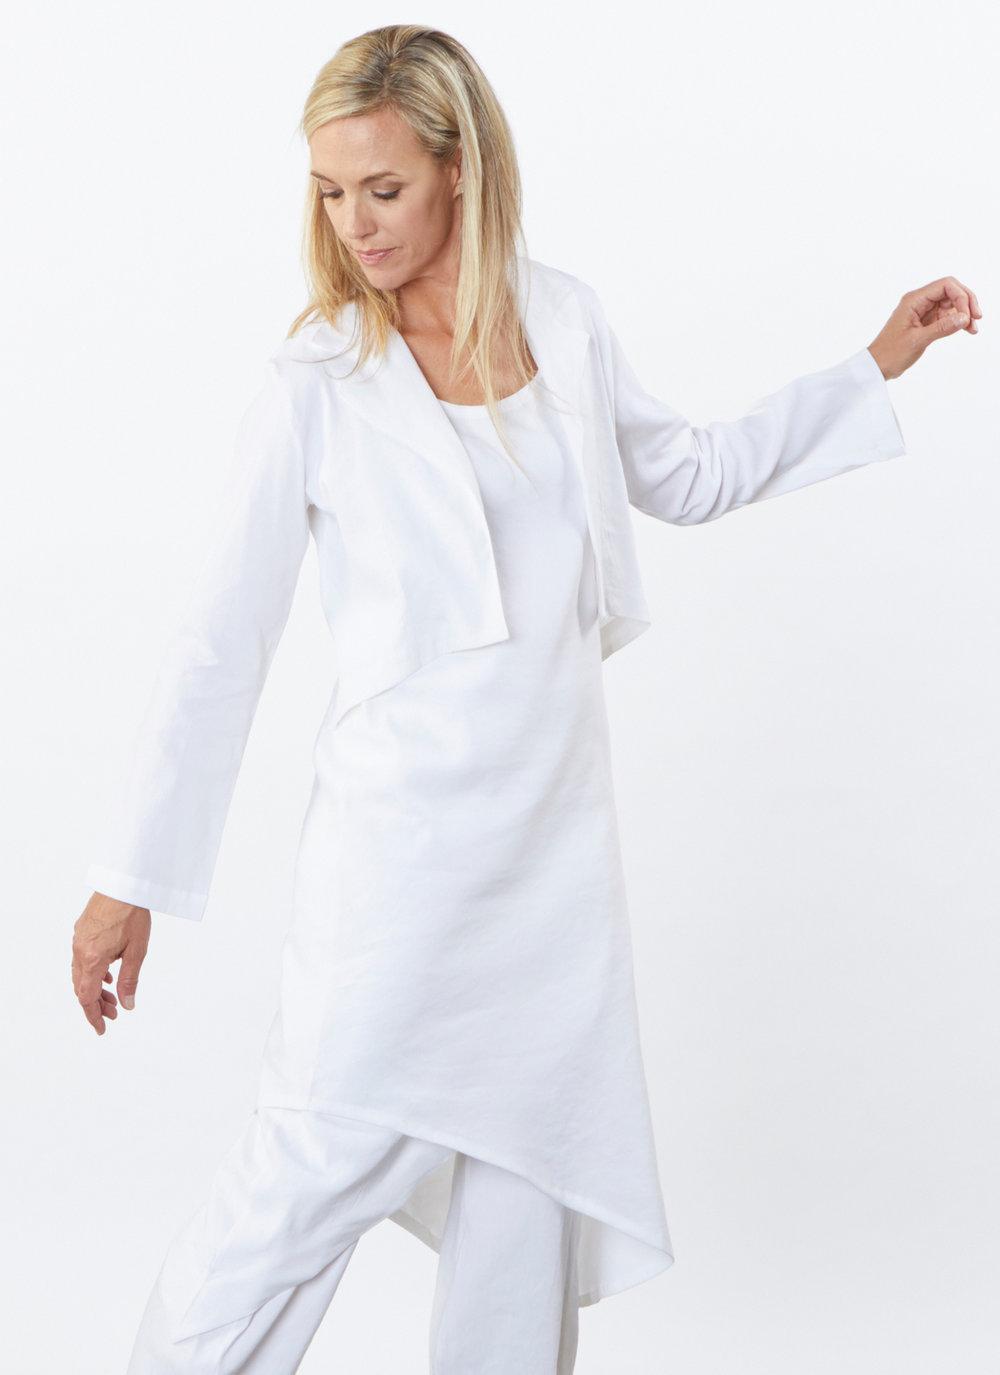 Hathaway Jacket, Euna Dress, Sofia Pant in White Ready for Bologna